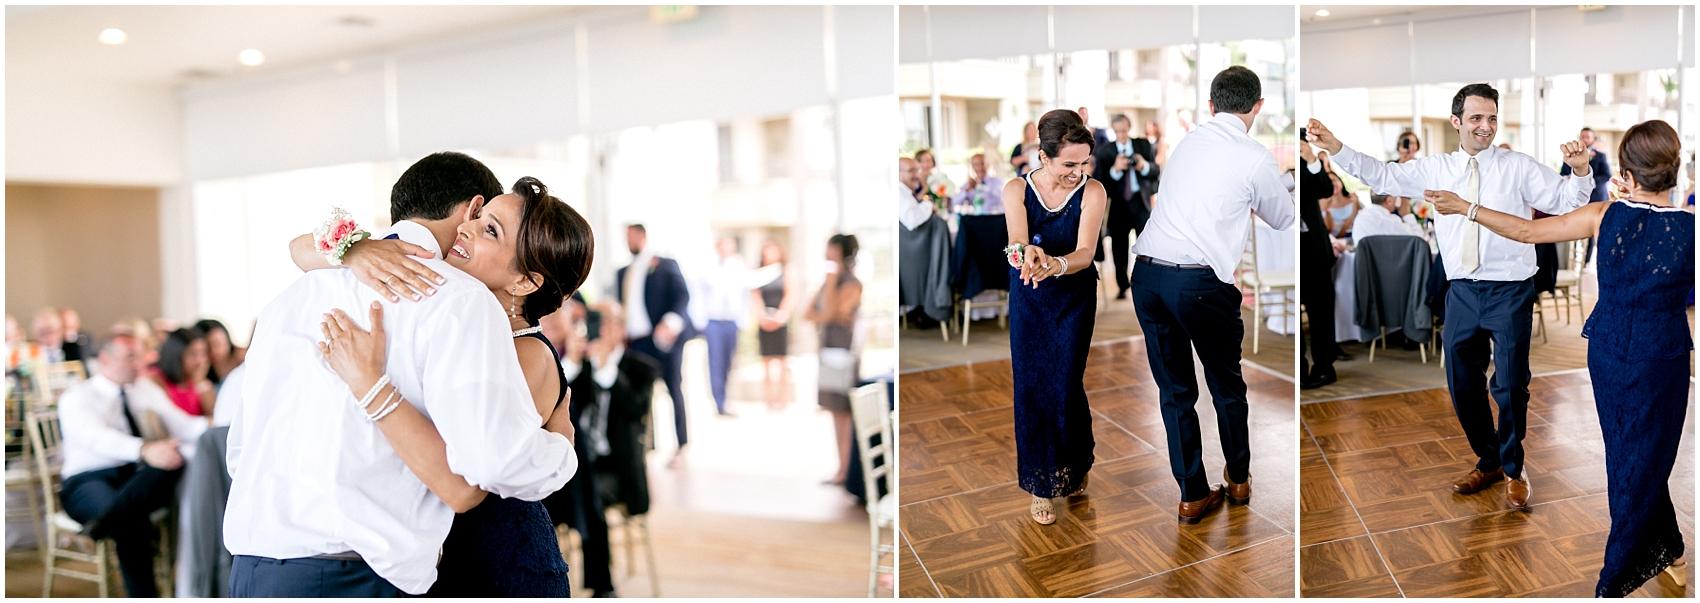 Jen and Mark's Wedding-0777.jpg